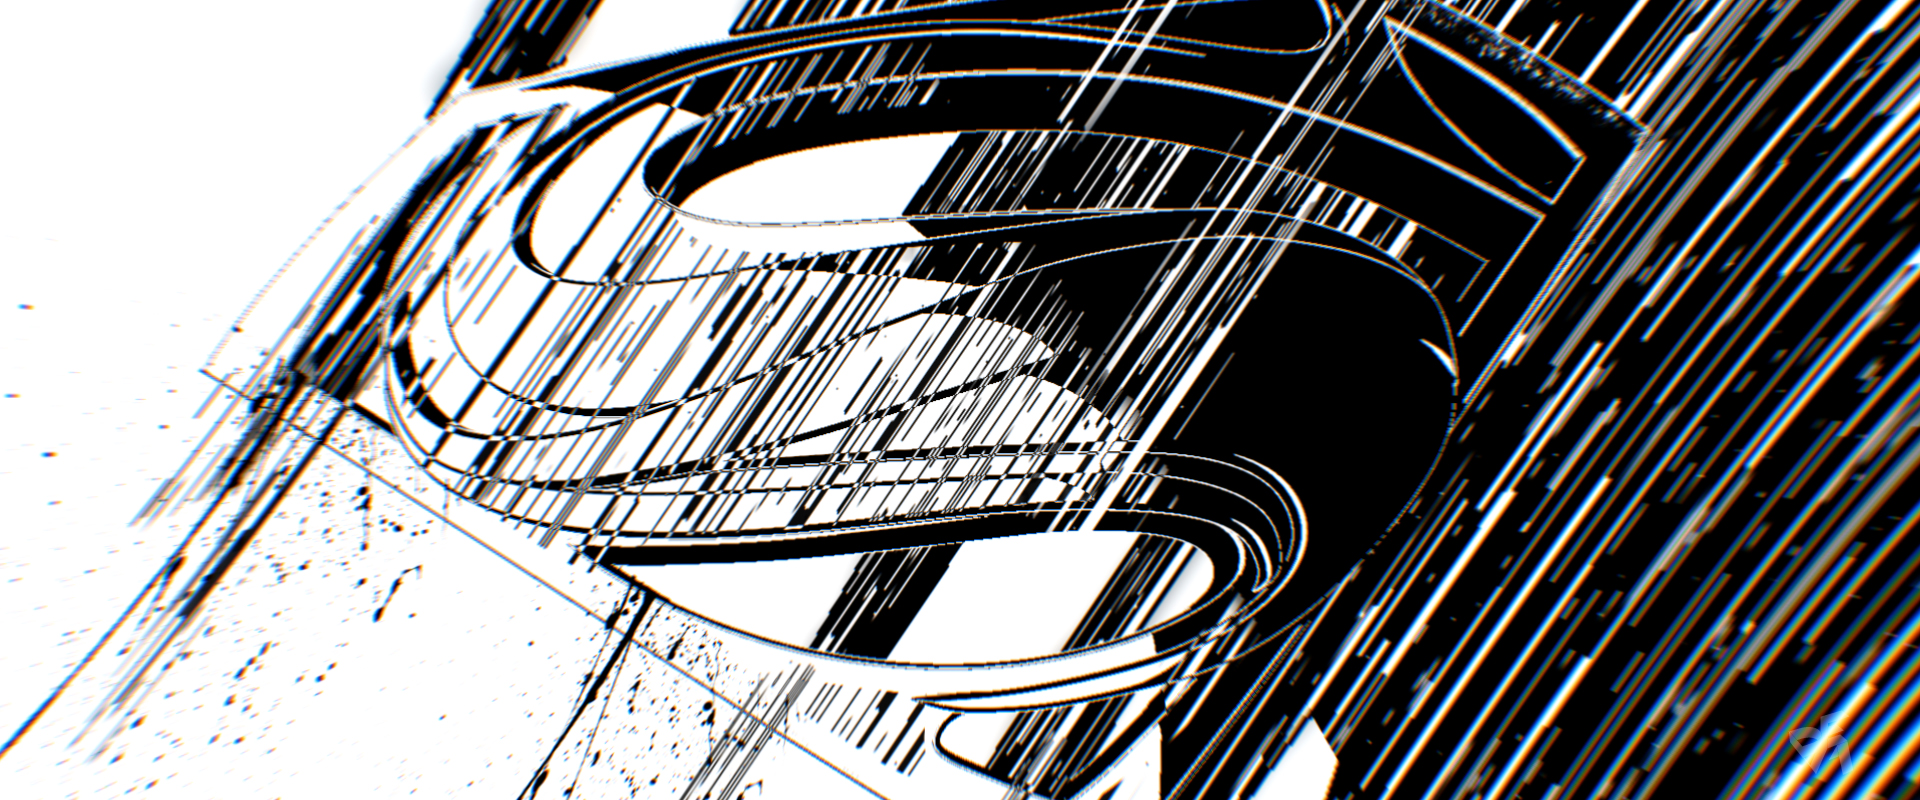 DC_STORYBOARD1_01.jpg